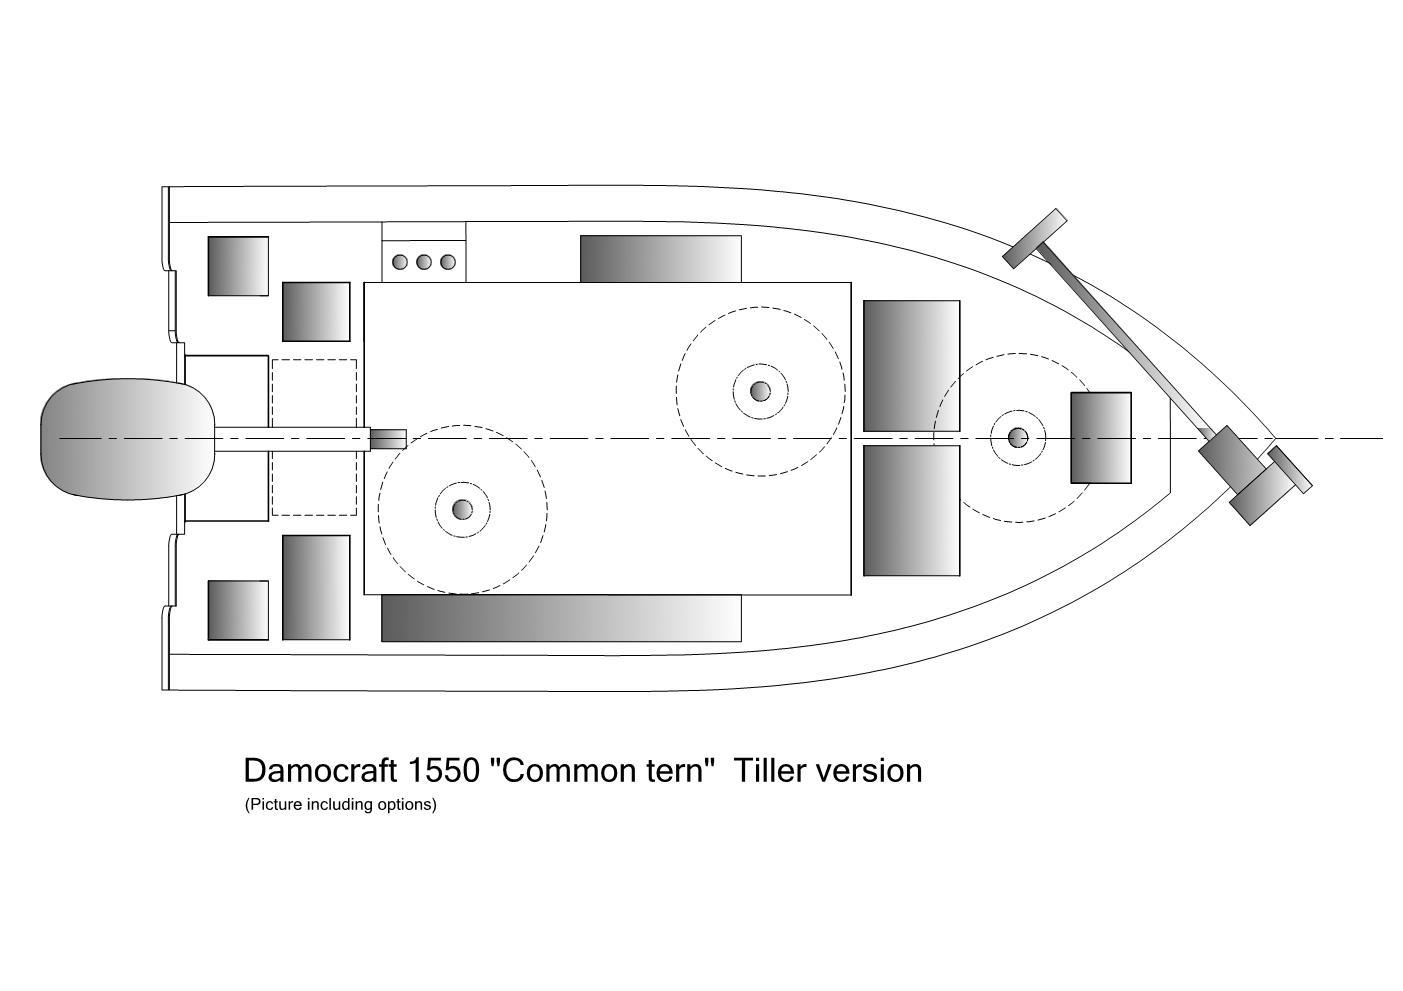 Damocraft 1550 Common tern Tiller version